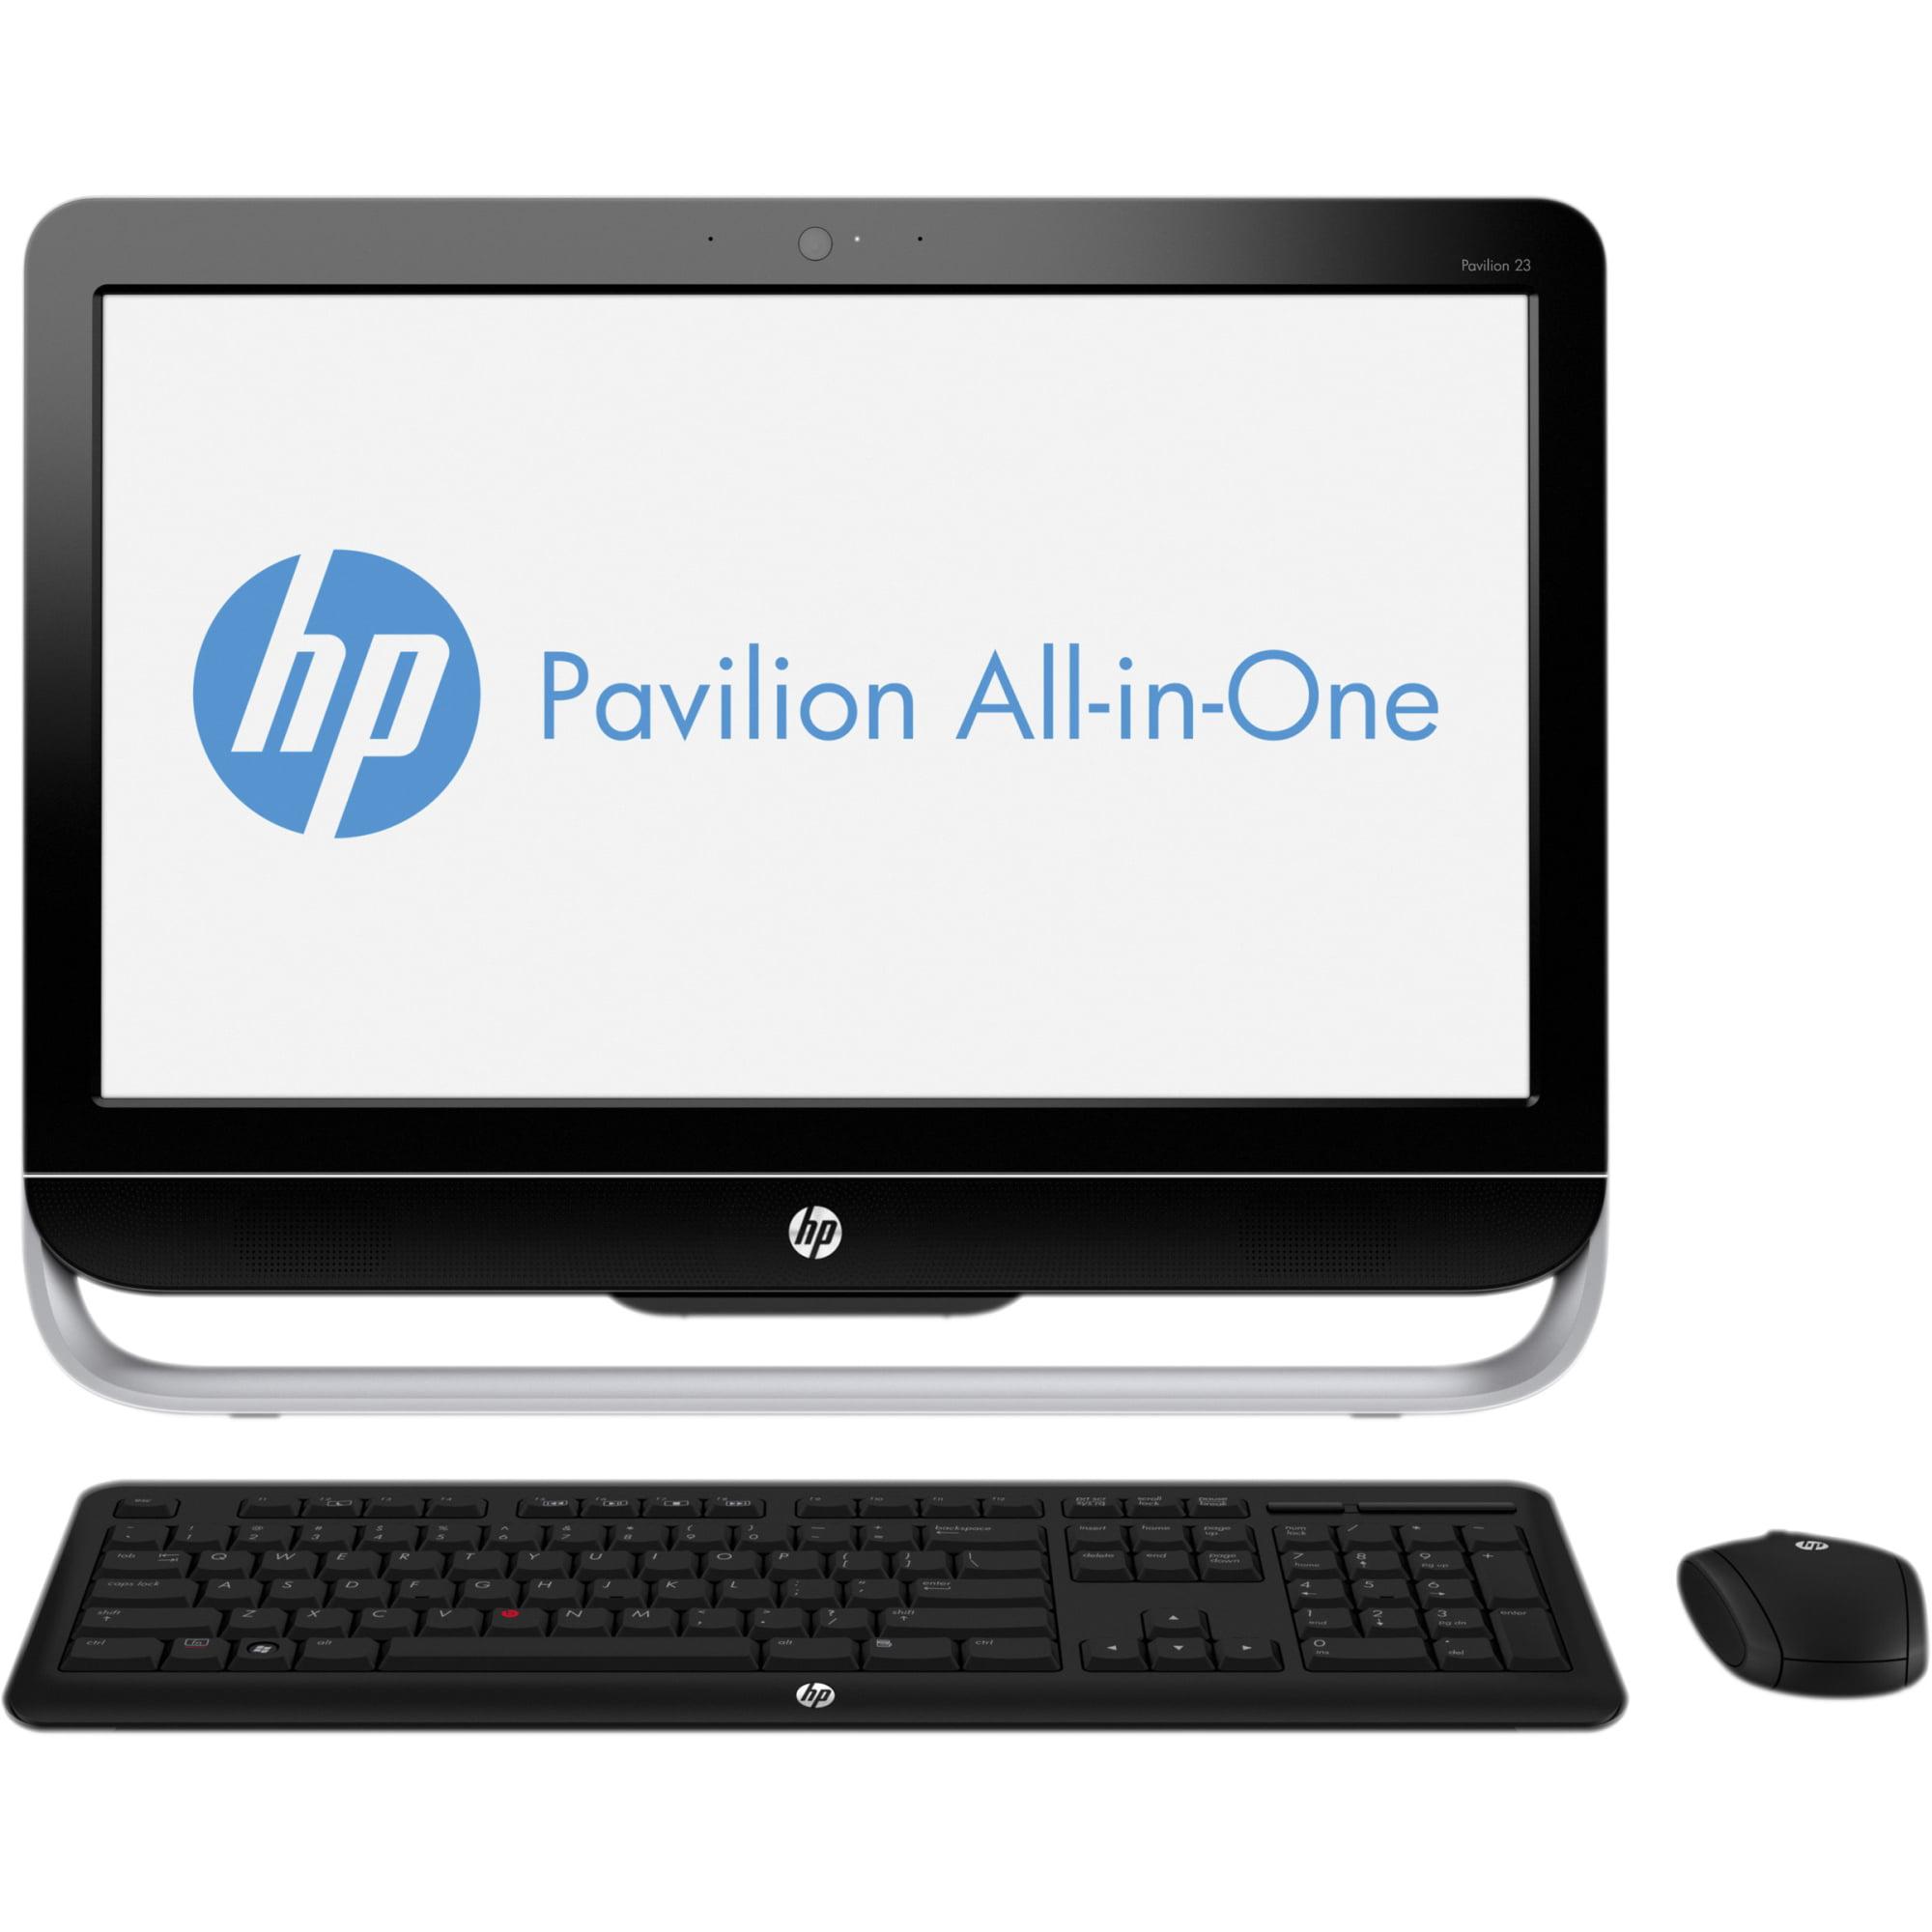 "HP Pavilion 23-b010 23"" 500 GB HDD Dual-core  1.70GHz 6GB RAM Black"